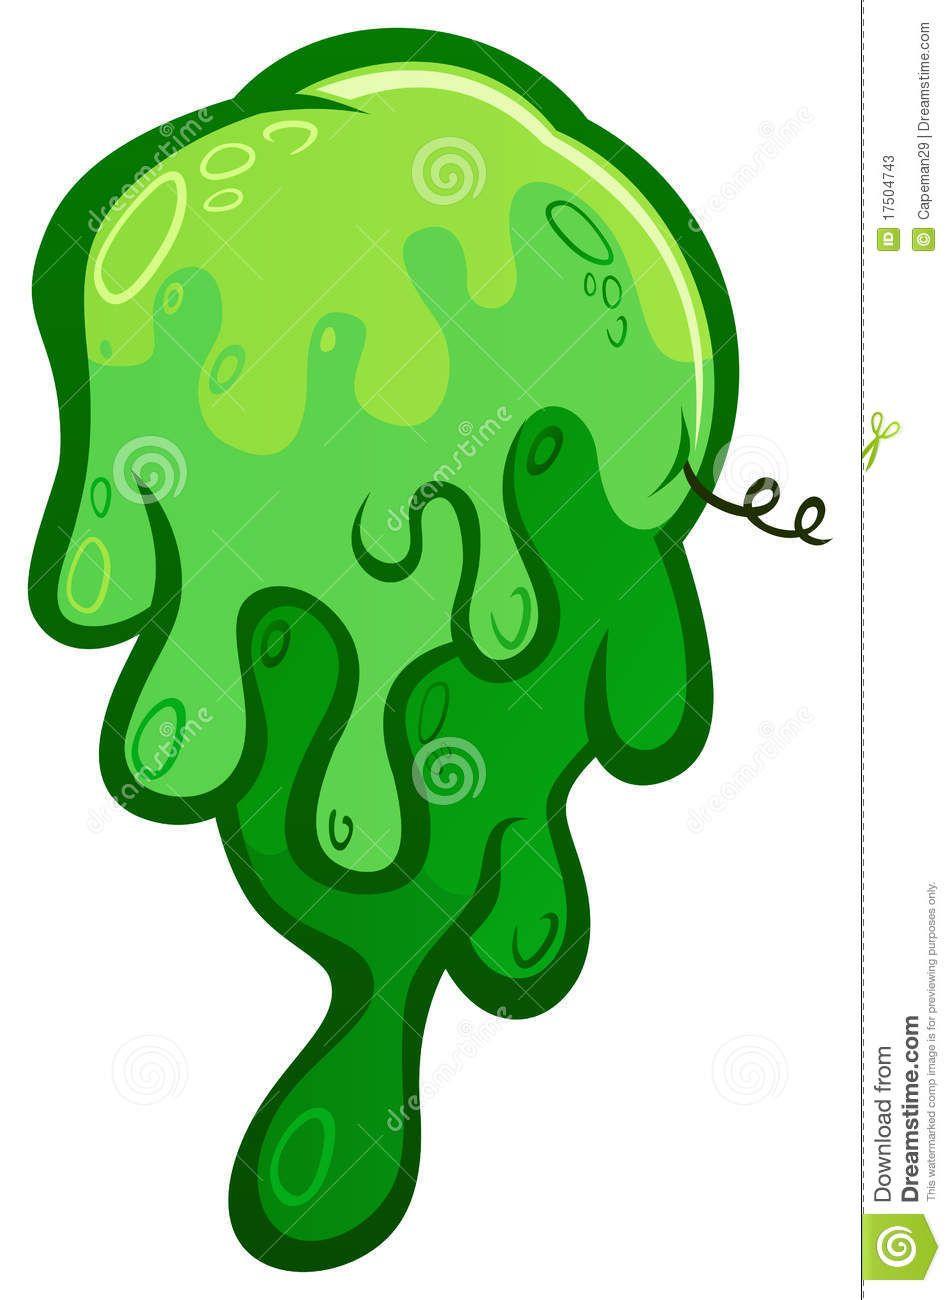 Slime Clipart Splat Green Svg Slime Party Trash Pack Party Slime